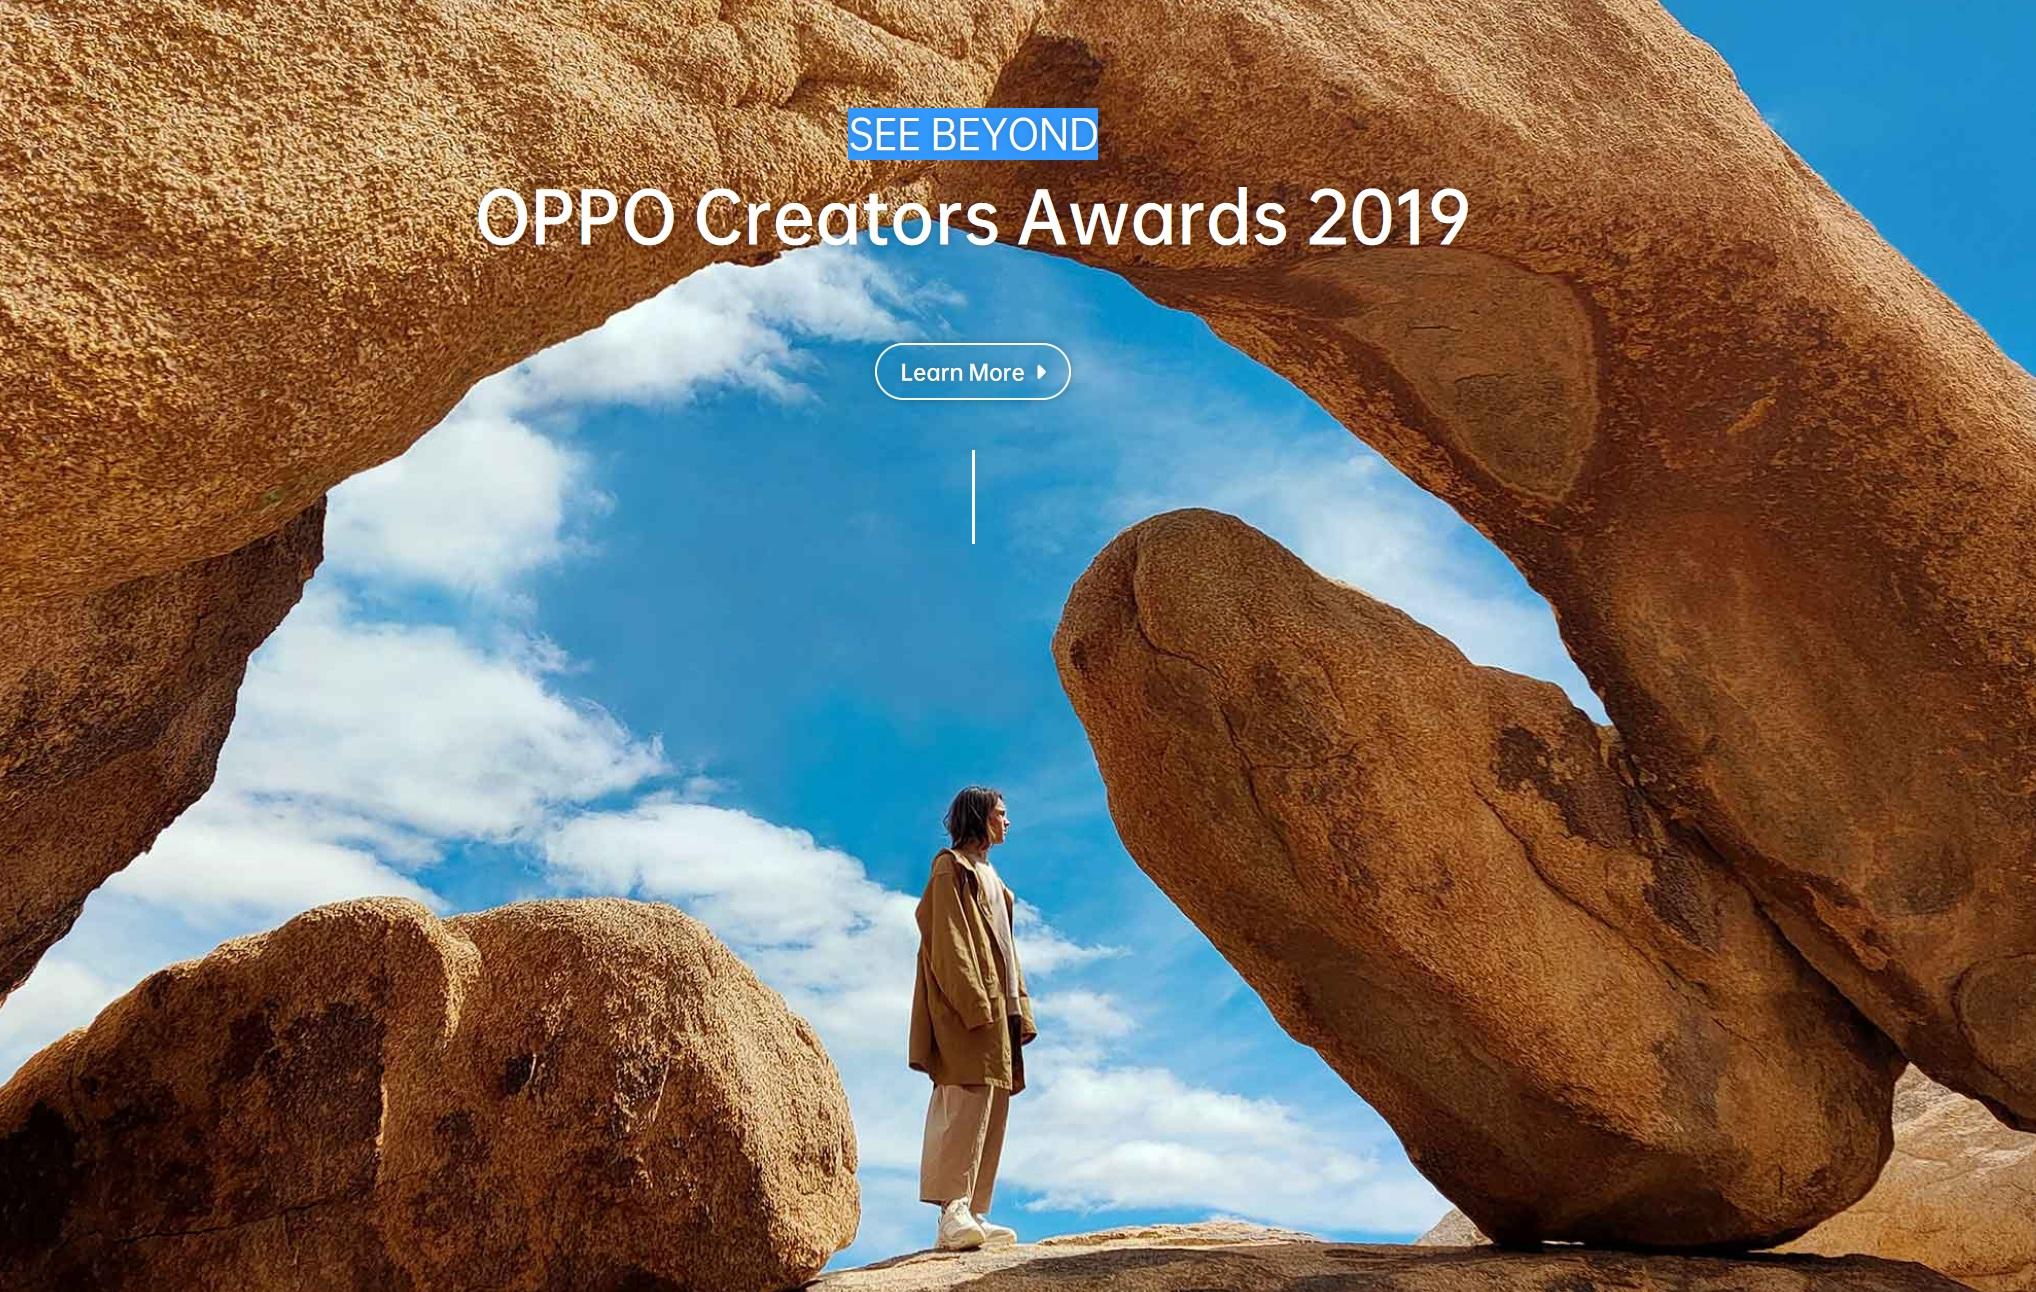 OPPO Creators Awards 2019 SEE BEYOND - logo